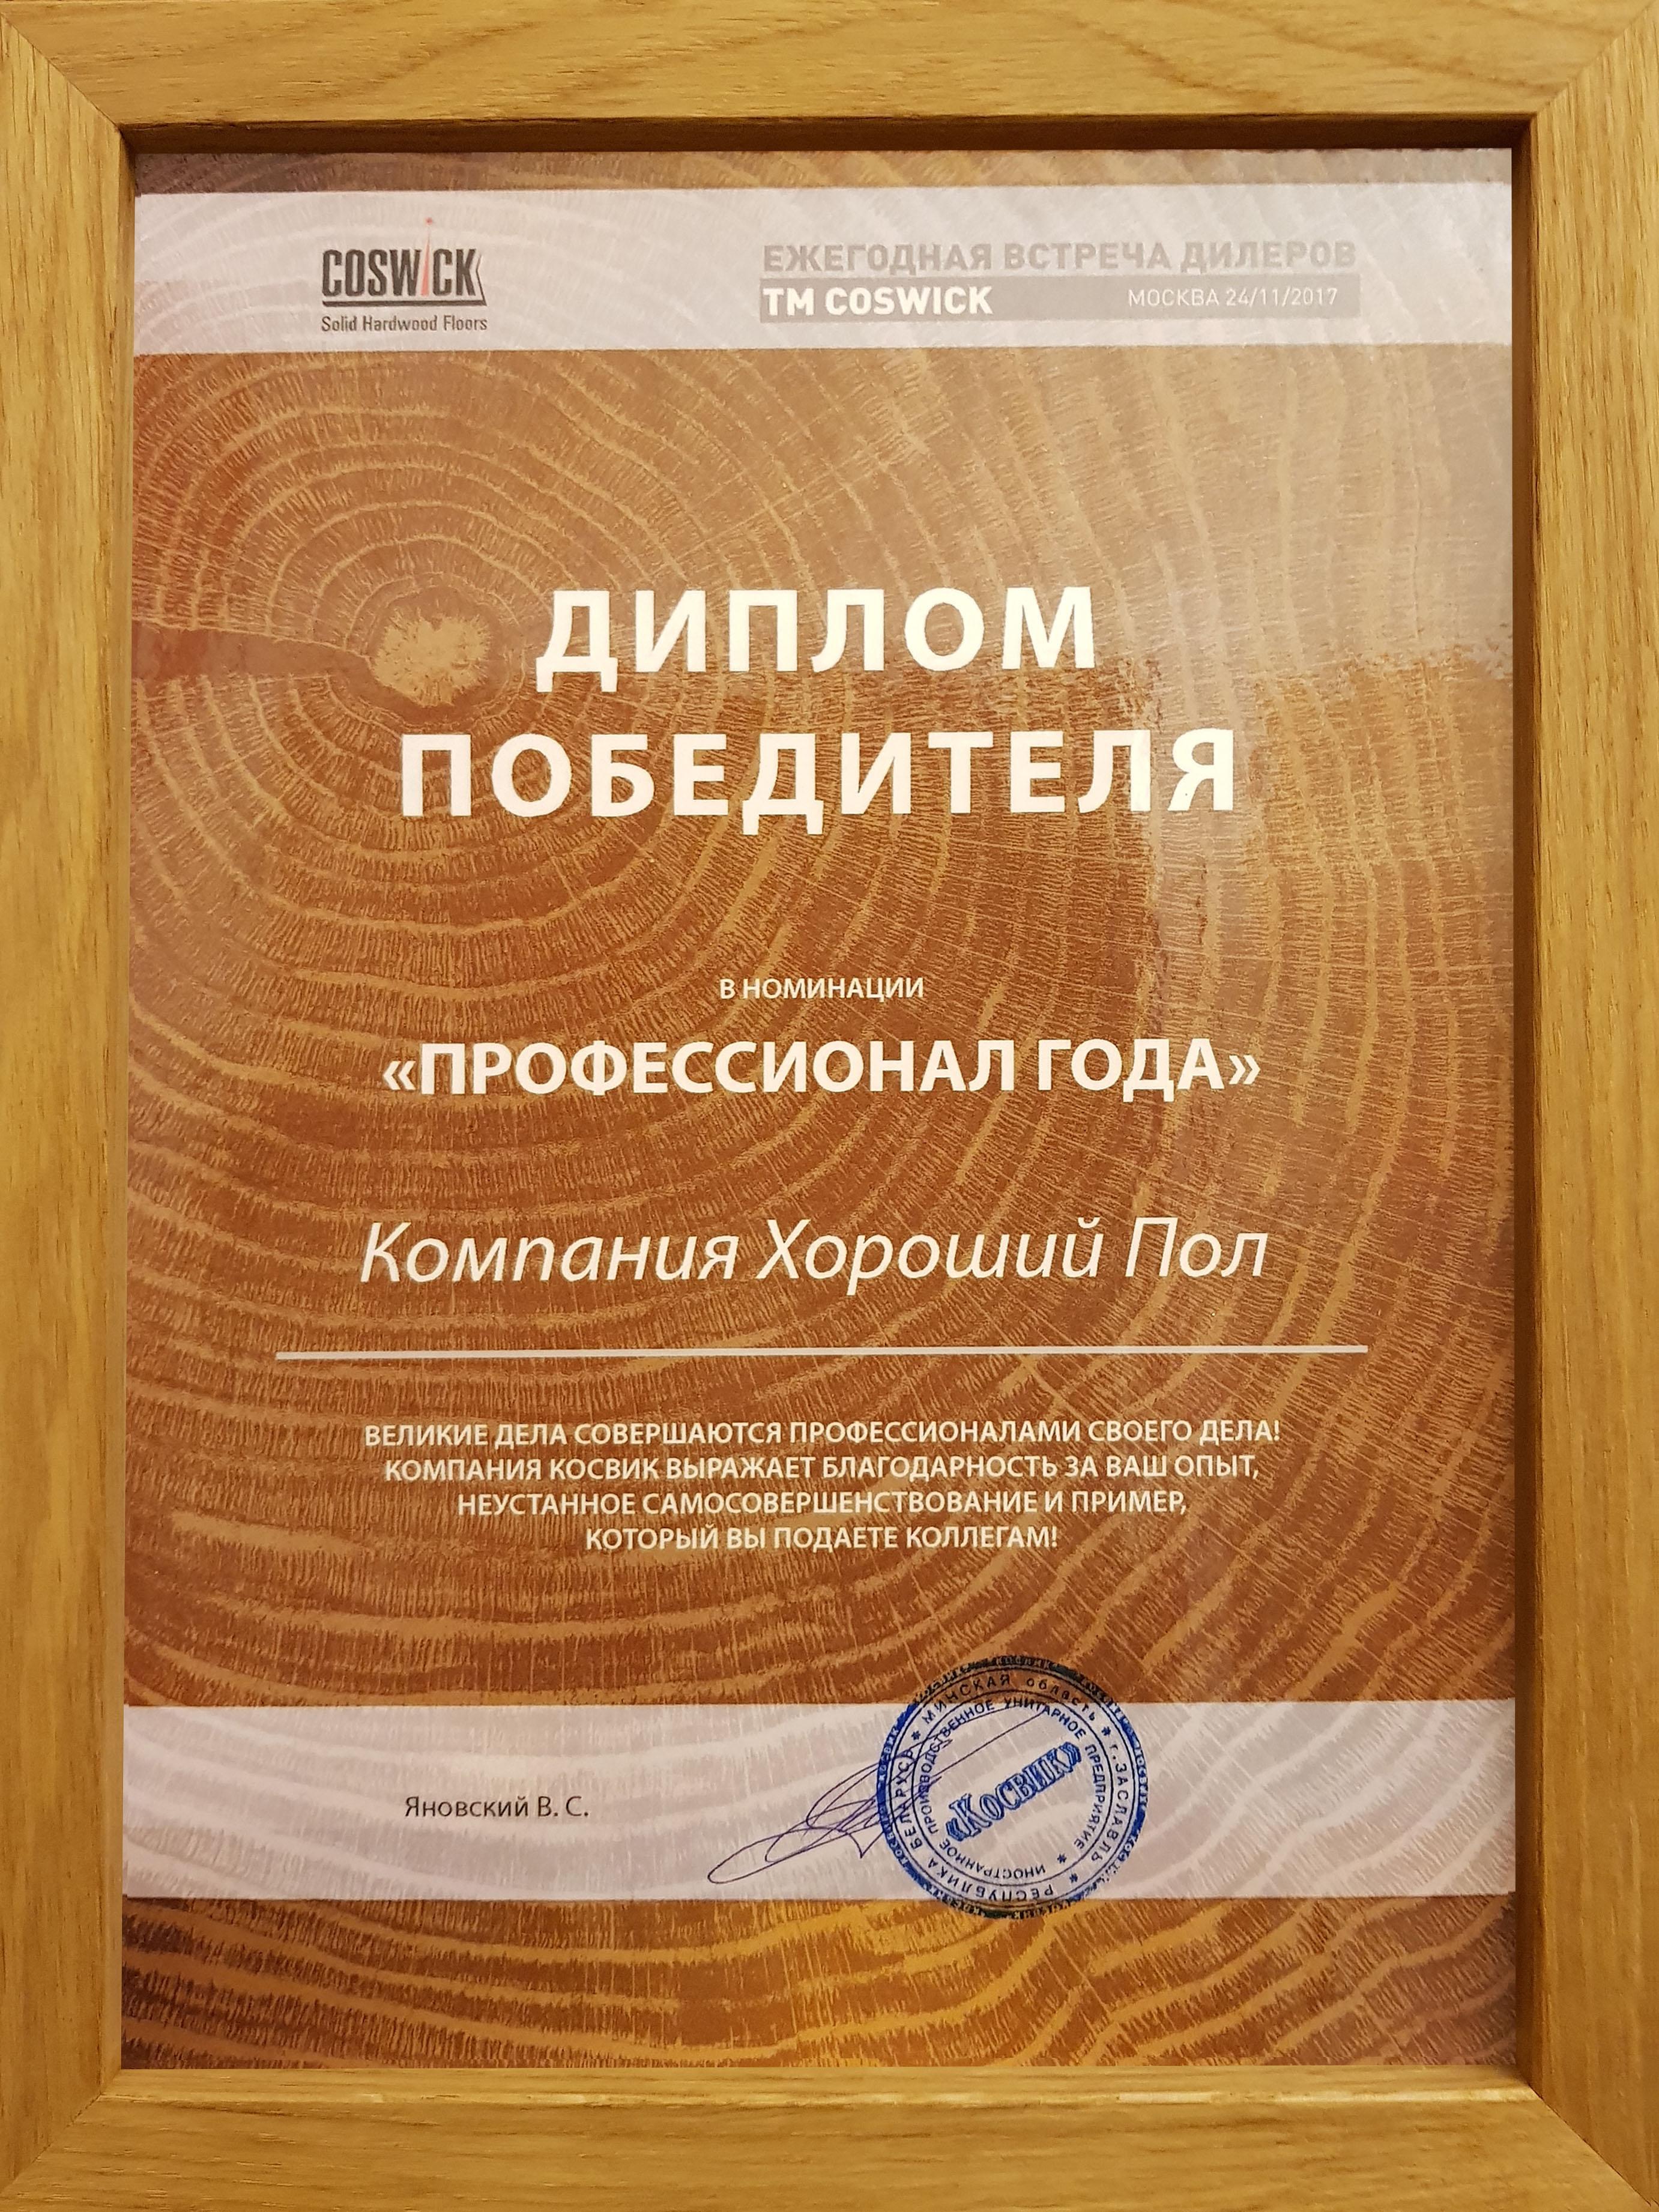 Косвик сертификат 8